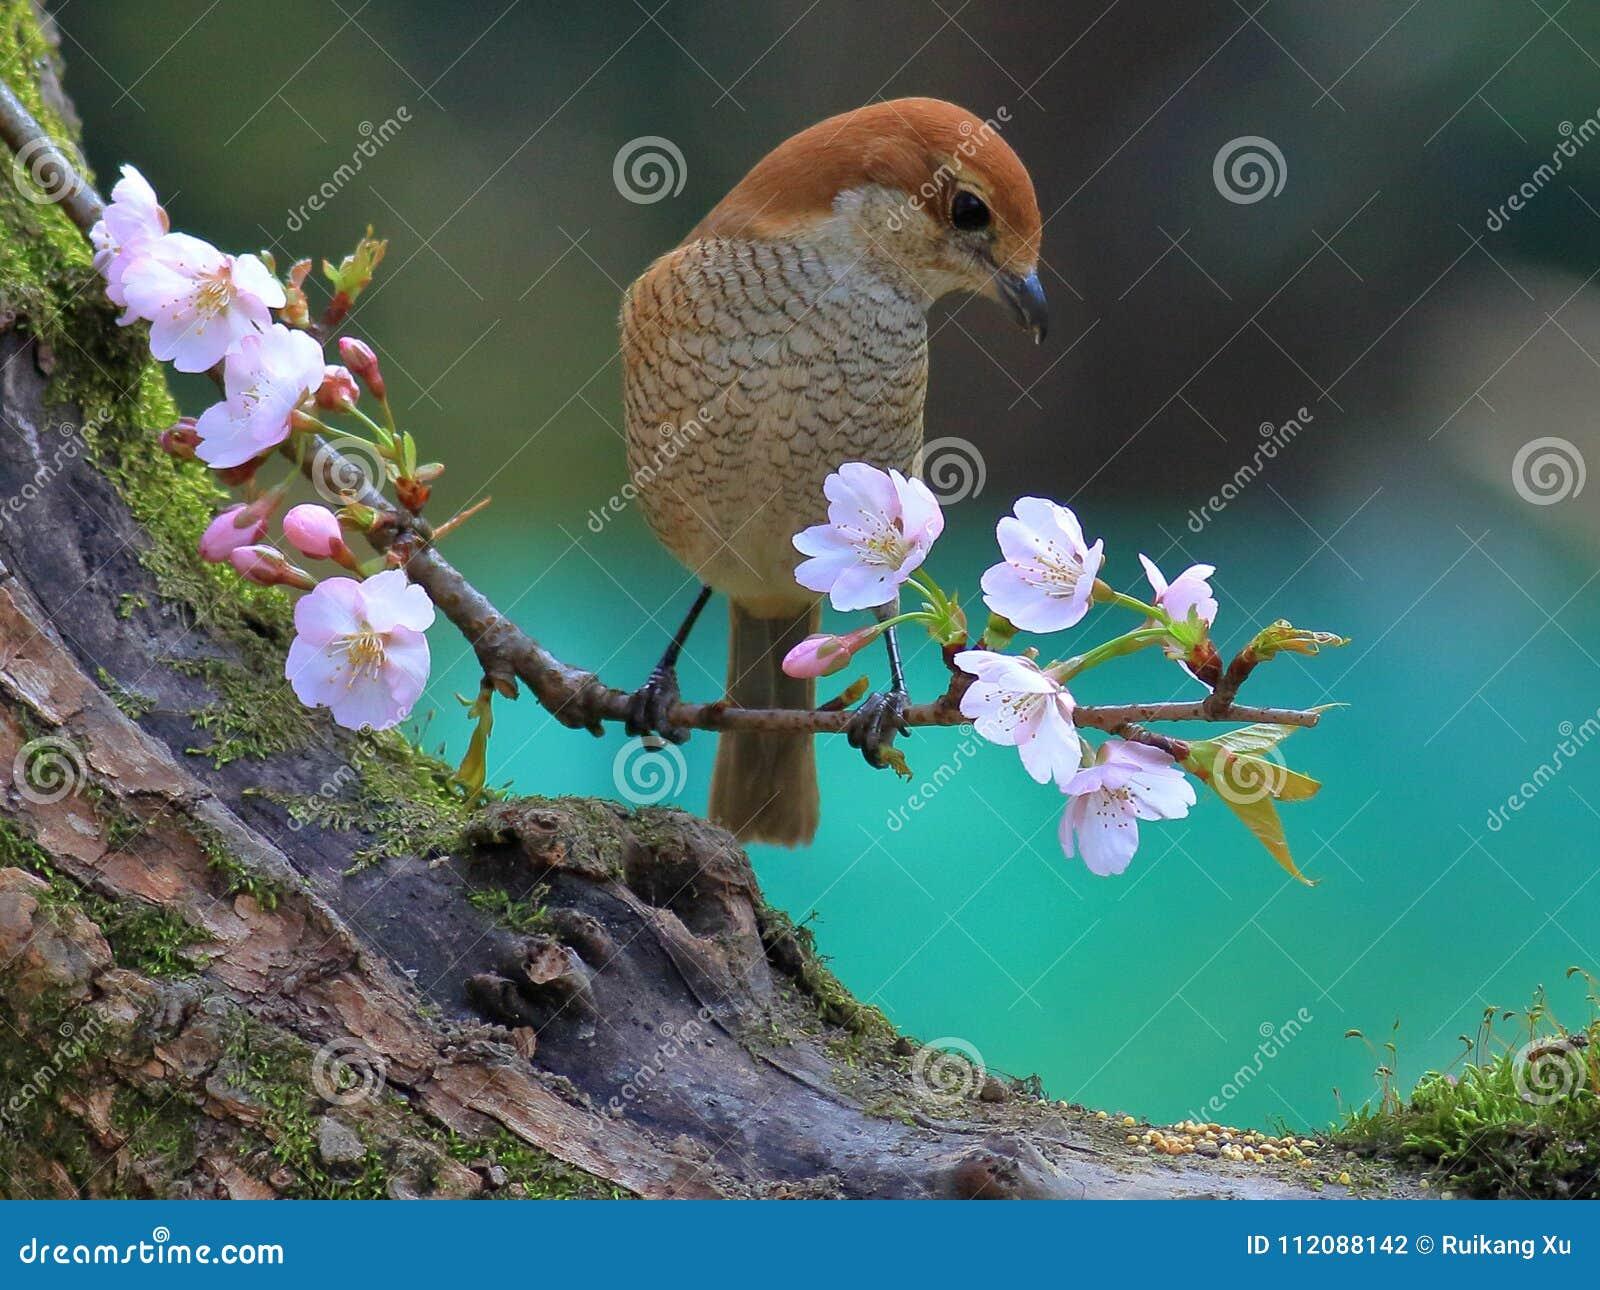 Spring Flowers And Birds Bull Headed Shrike And Cherry Blossoms